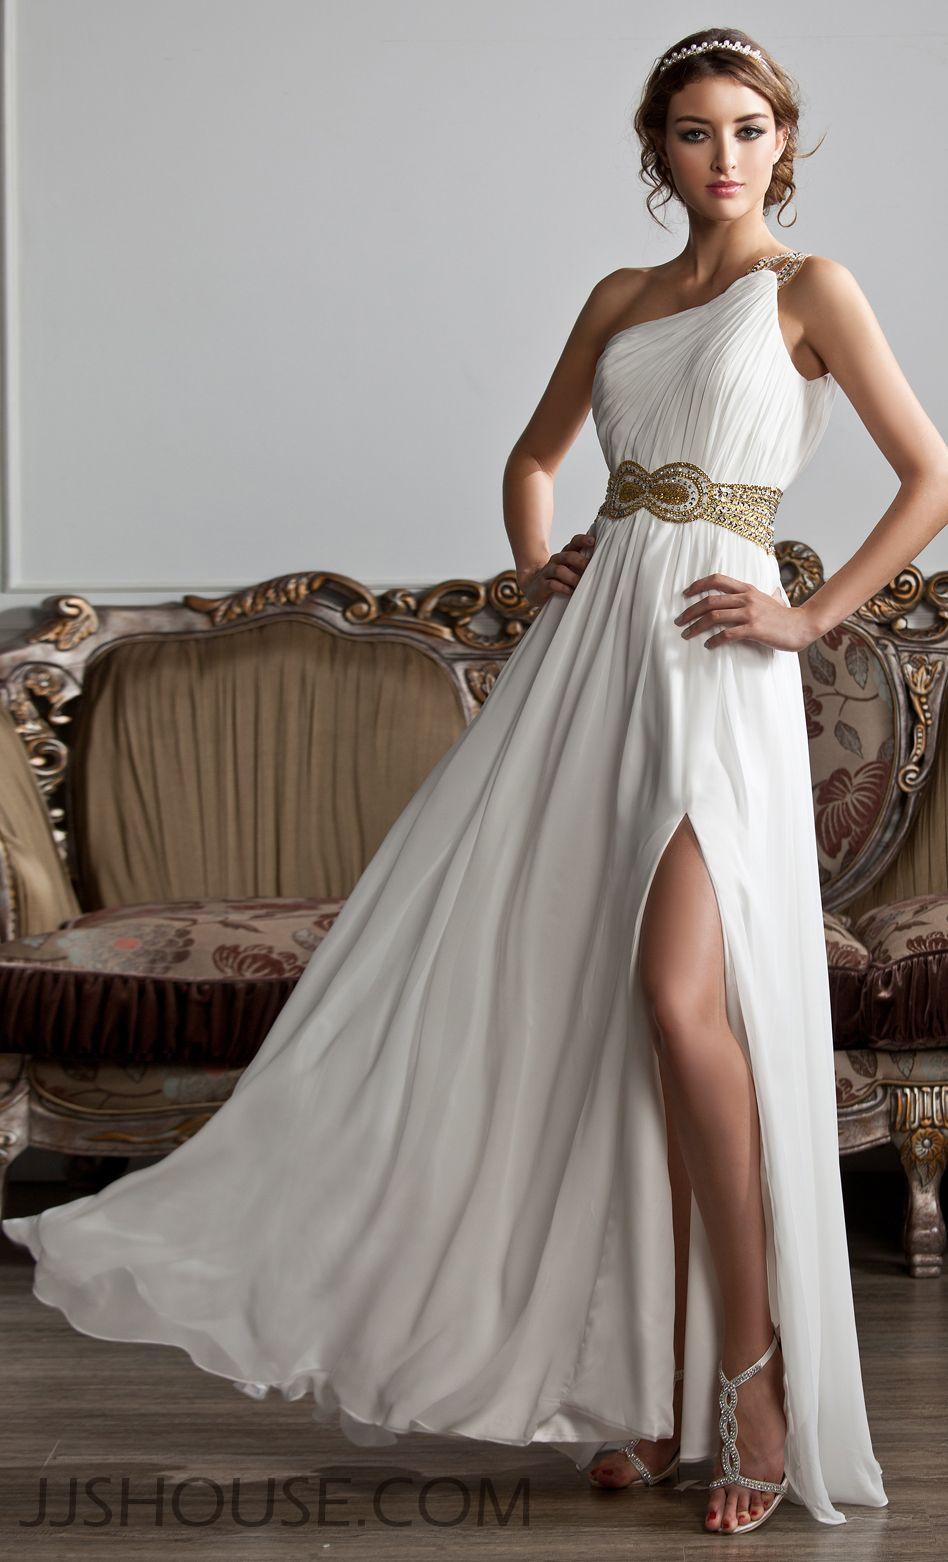 Alineprincess oneshoulder floorlength chiffon prom dresses with